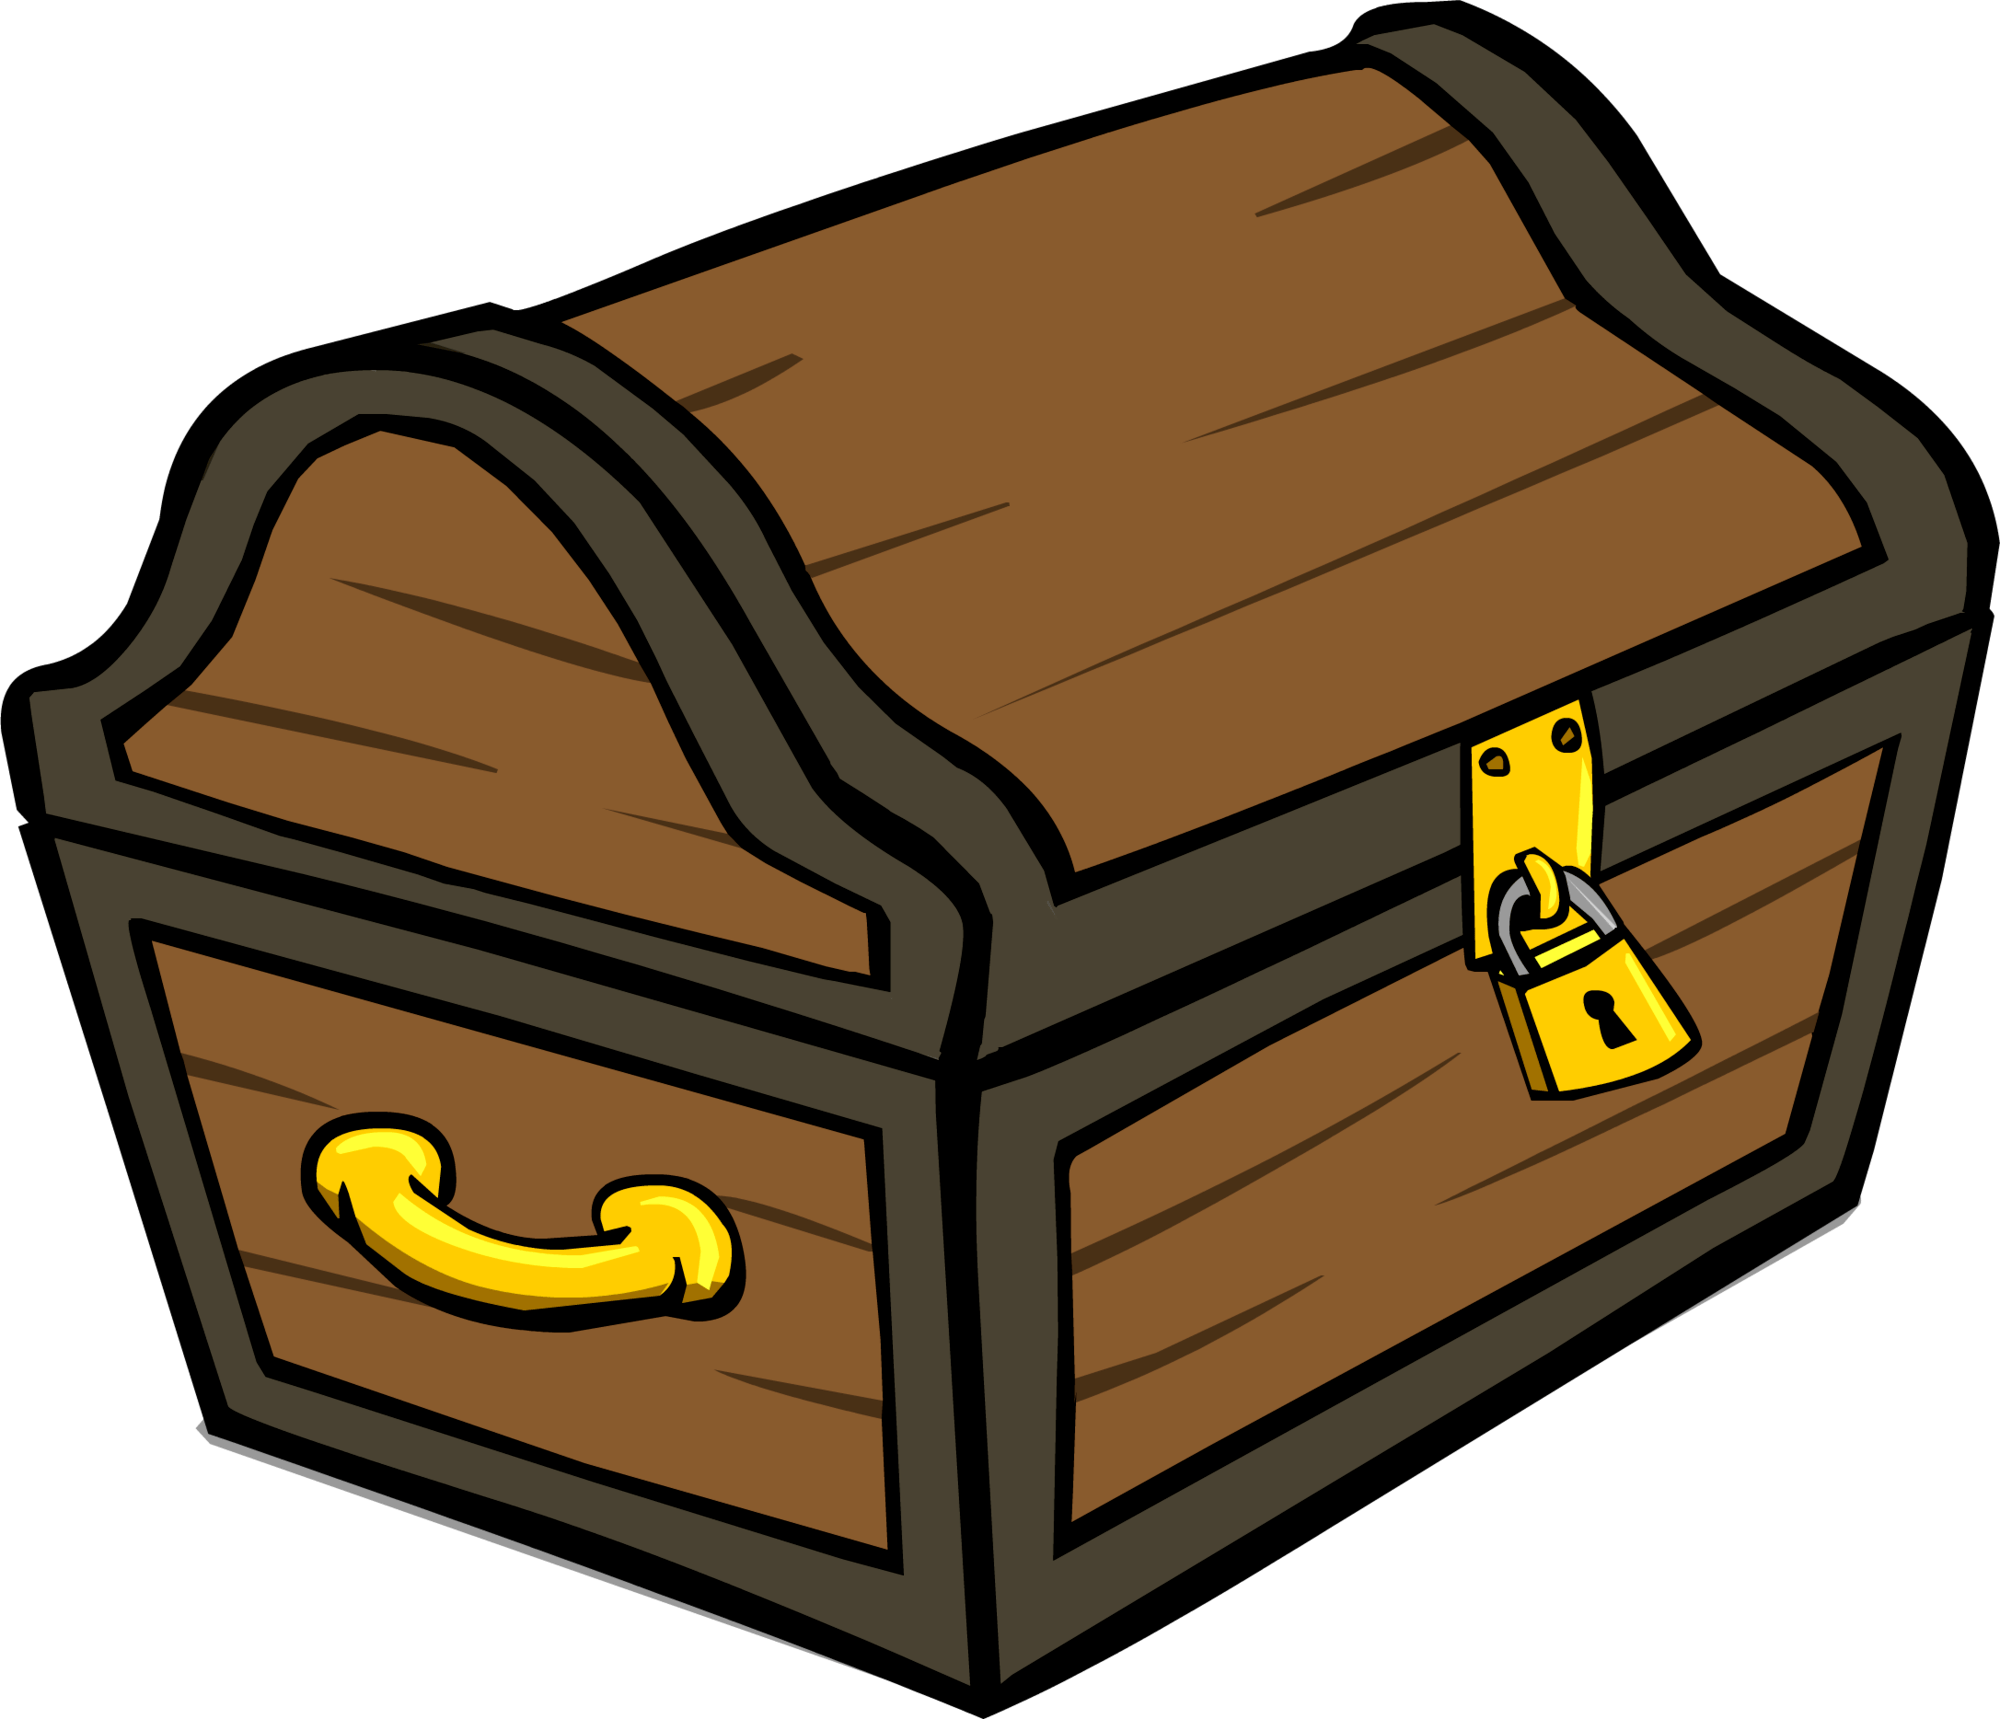 Transparent pirate treasure chest clipart - Treasure Chest Id 305 Sprite Club - Treasure Chest Transparent Background